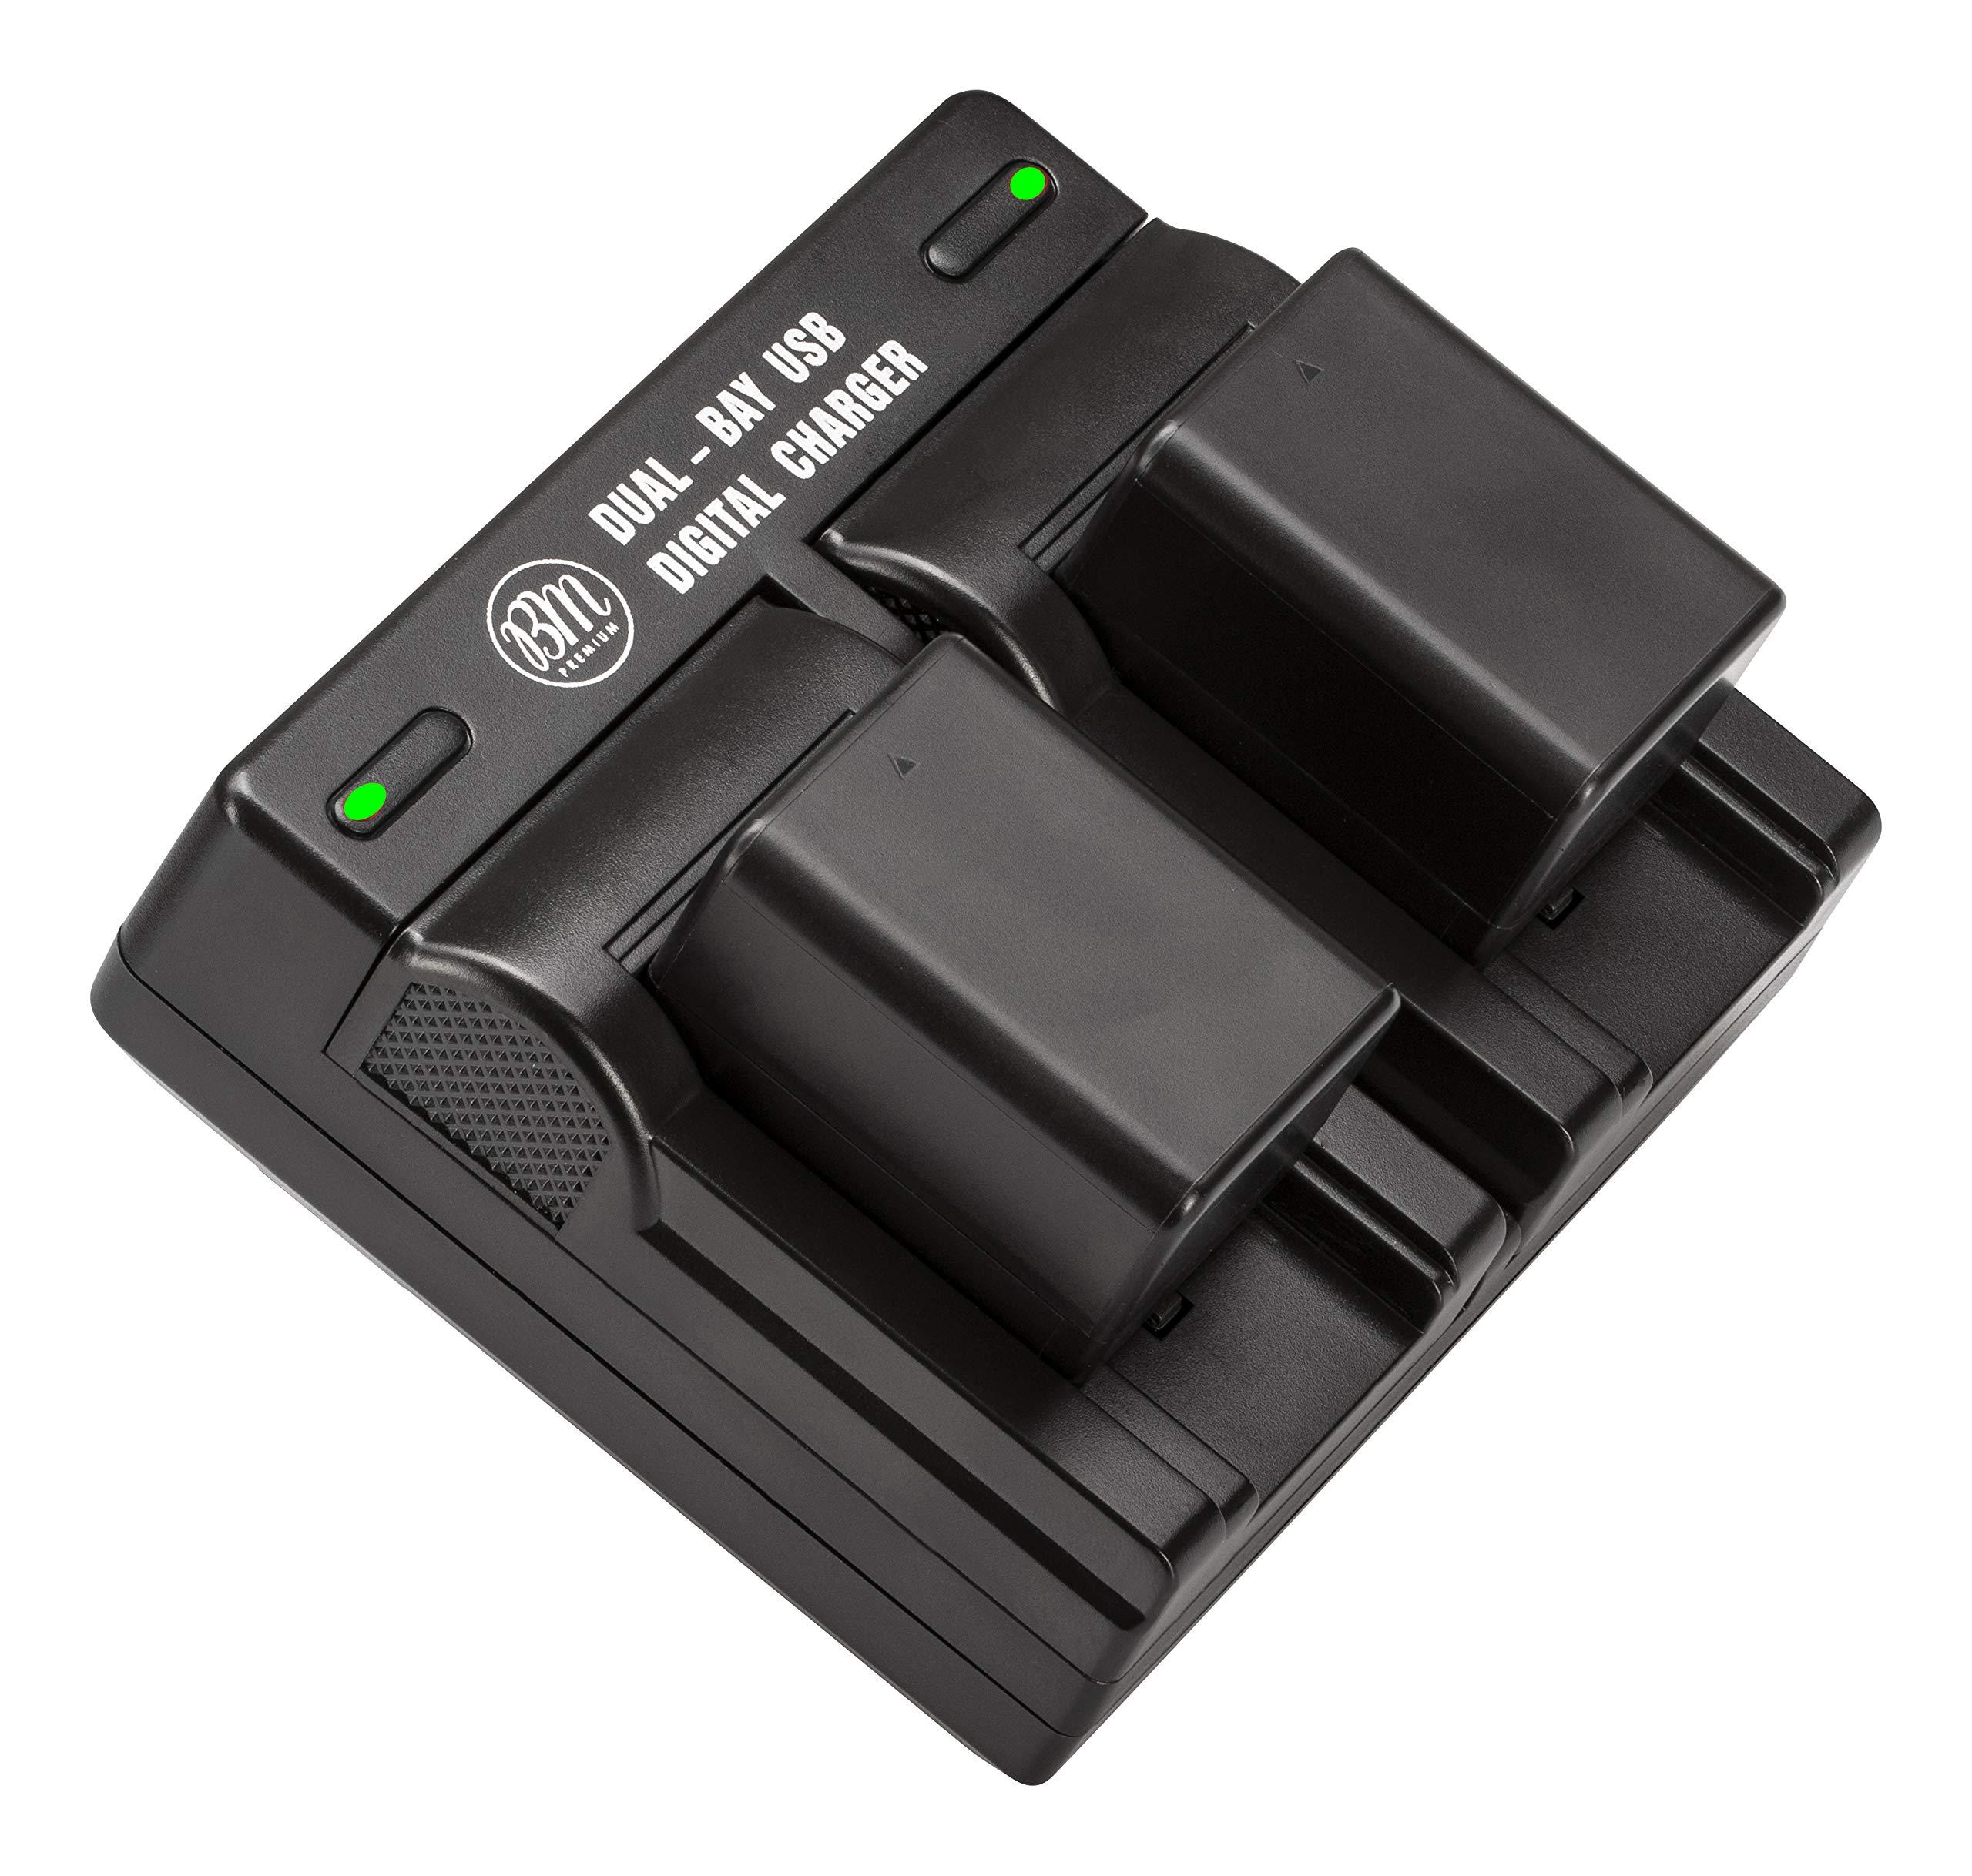 BM Premium 2 VW-VBT190 Batteries and Dual Battery Charger for Panasonic HC-V800K, HC-VX1K, HC-WXF1K, HCV510, V520, V550, V710, HCV720, HC-V750, HC-V770, HC-VX870, HC-VX981, HC-W580, HC-W850, HC-WXF991